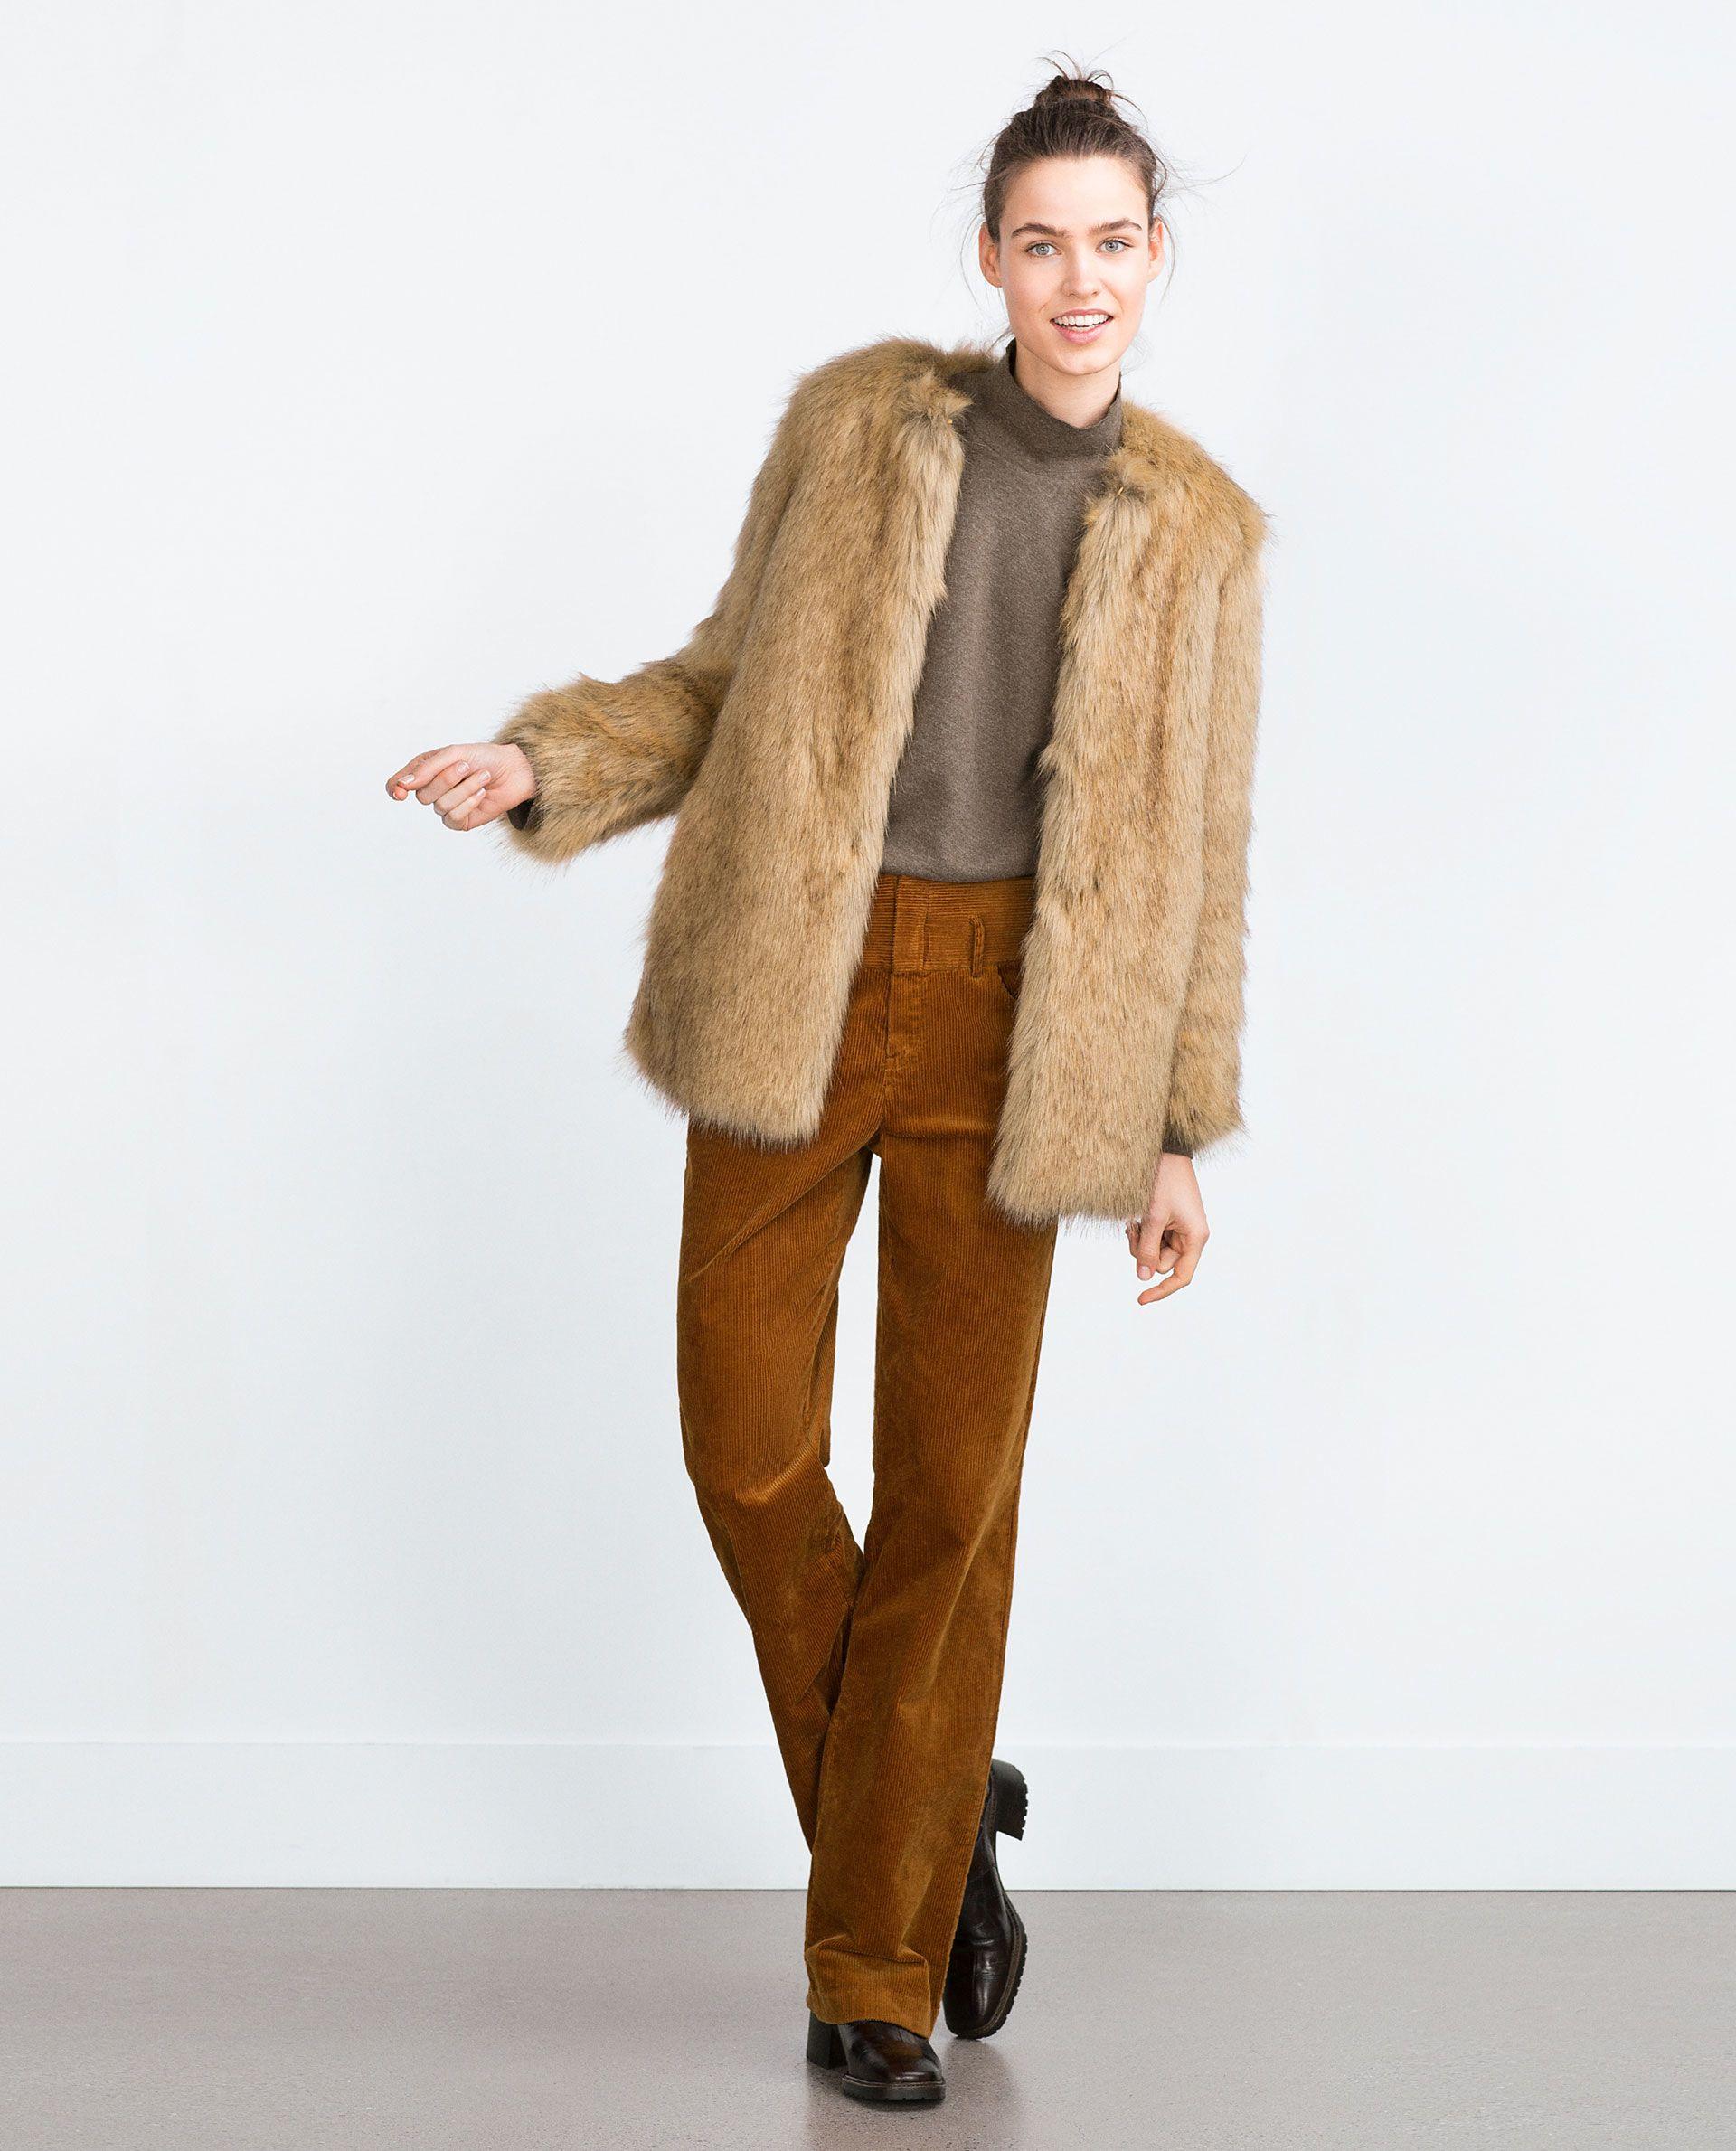 Faux Fur Love Shirley S Wardrobe Fashion Beauty Lifestyle